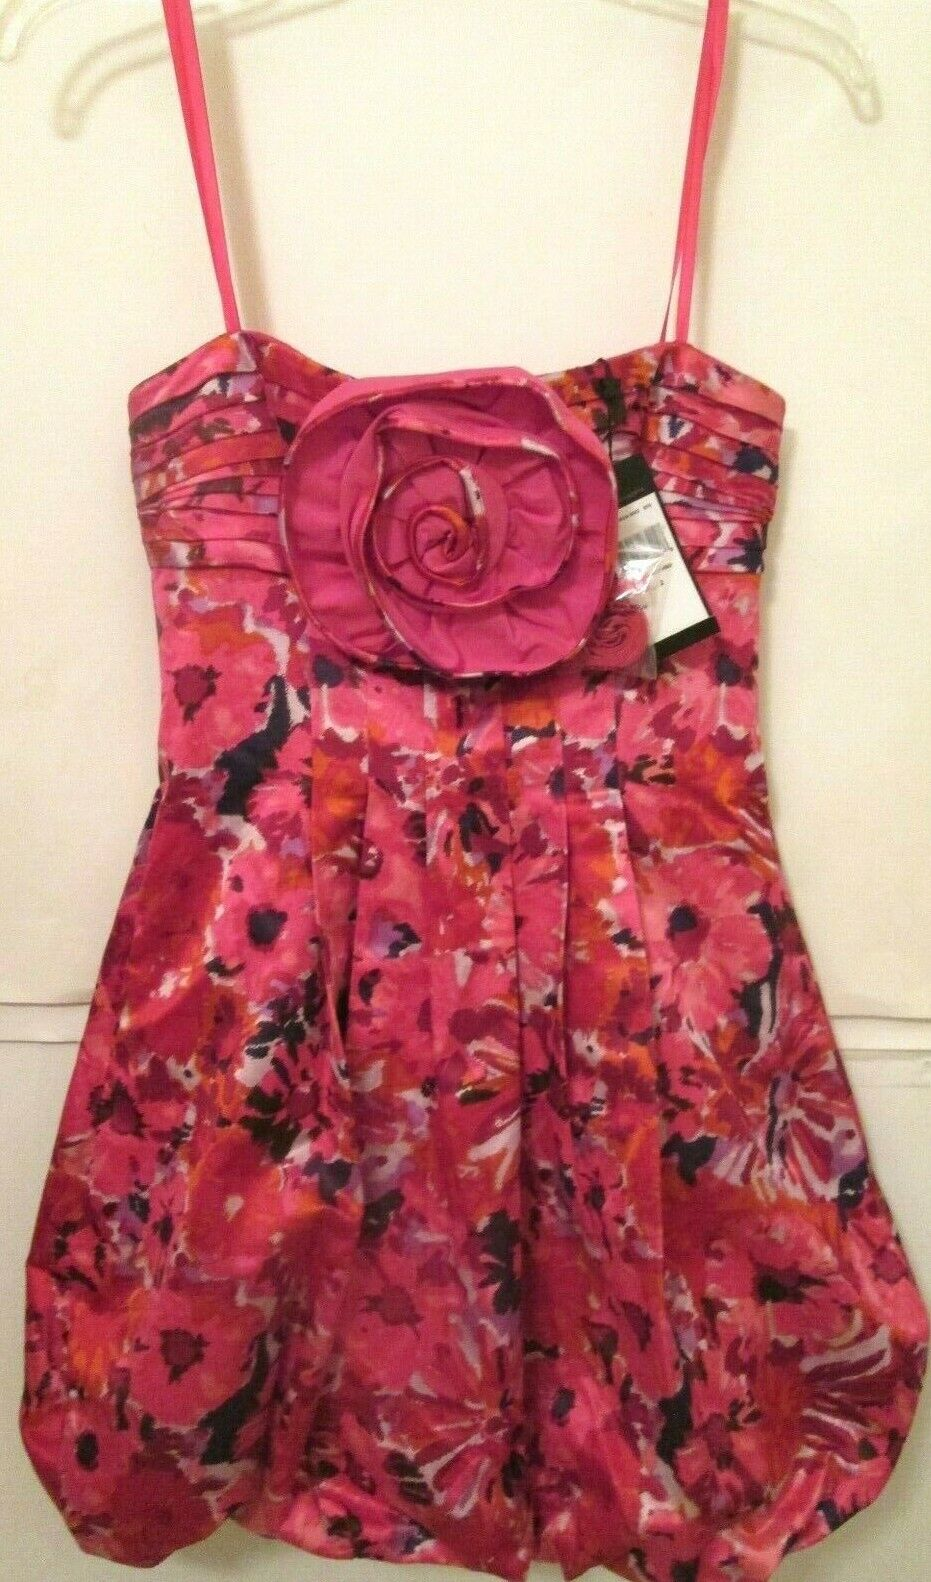 BCBG MAXAZRIA Ladies Größe 2 Rosa Floral Begonia Combo Strapless Dress  Nwts